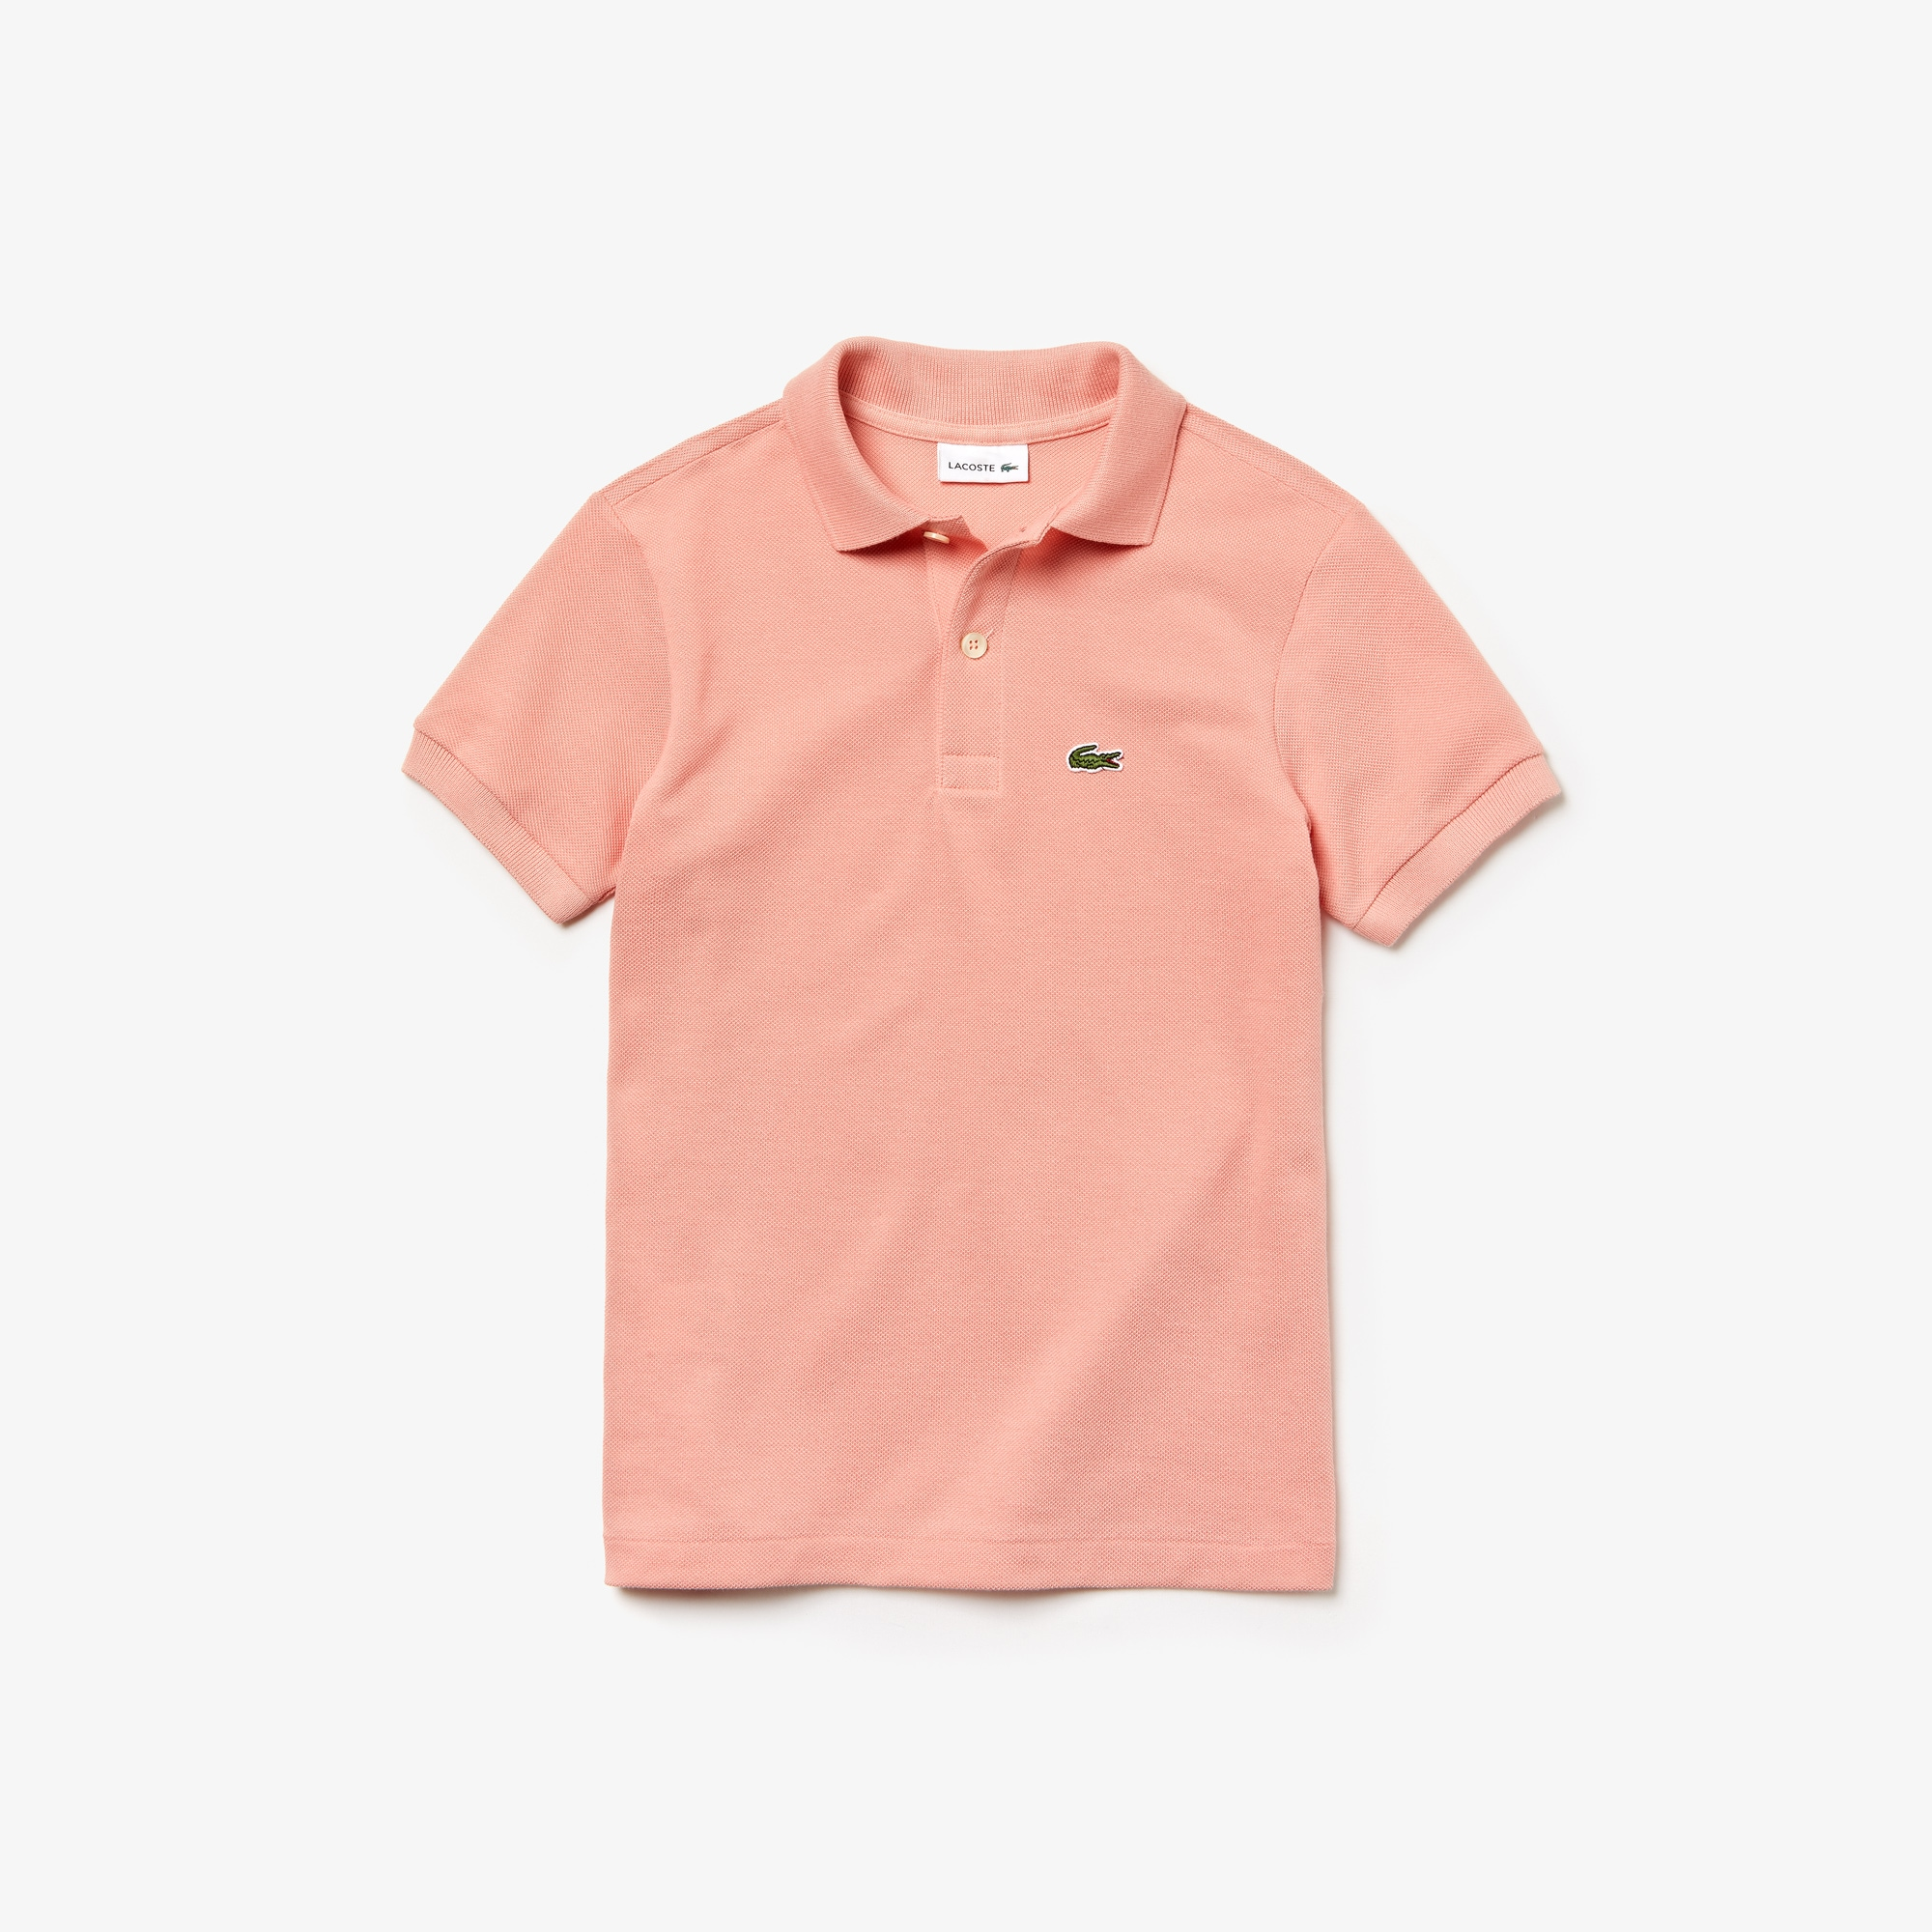 6abbb245e6 Boy's Polo Shirts | The Lacoste Polo For Kids | LACOSTE